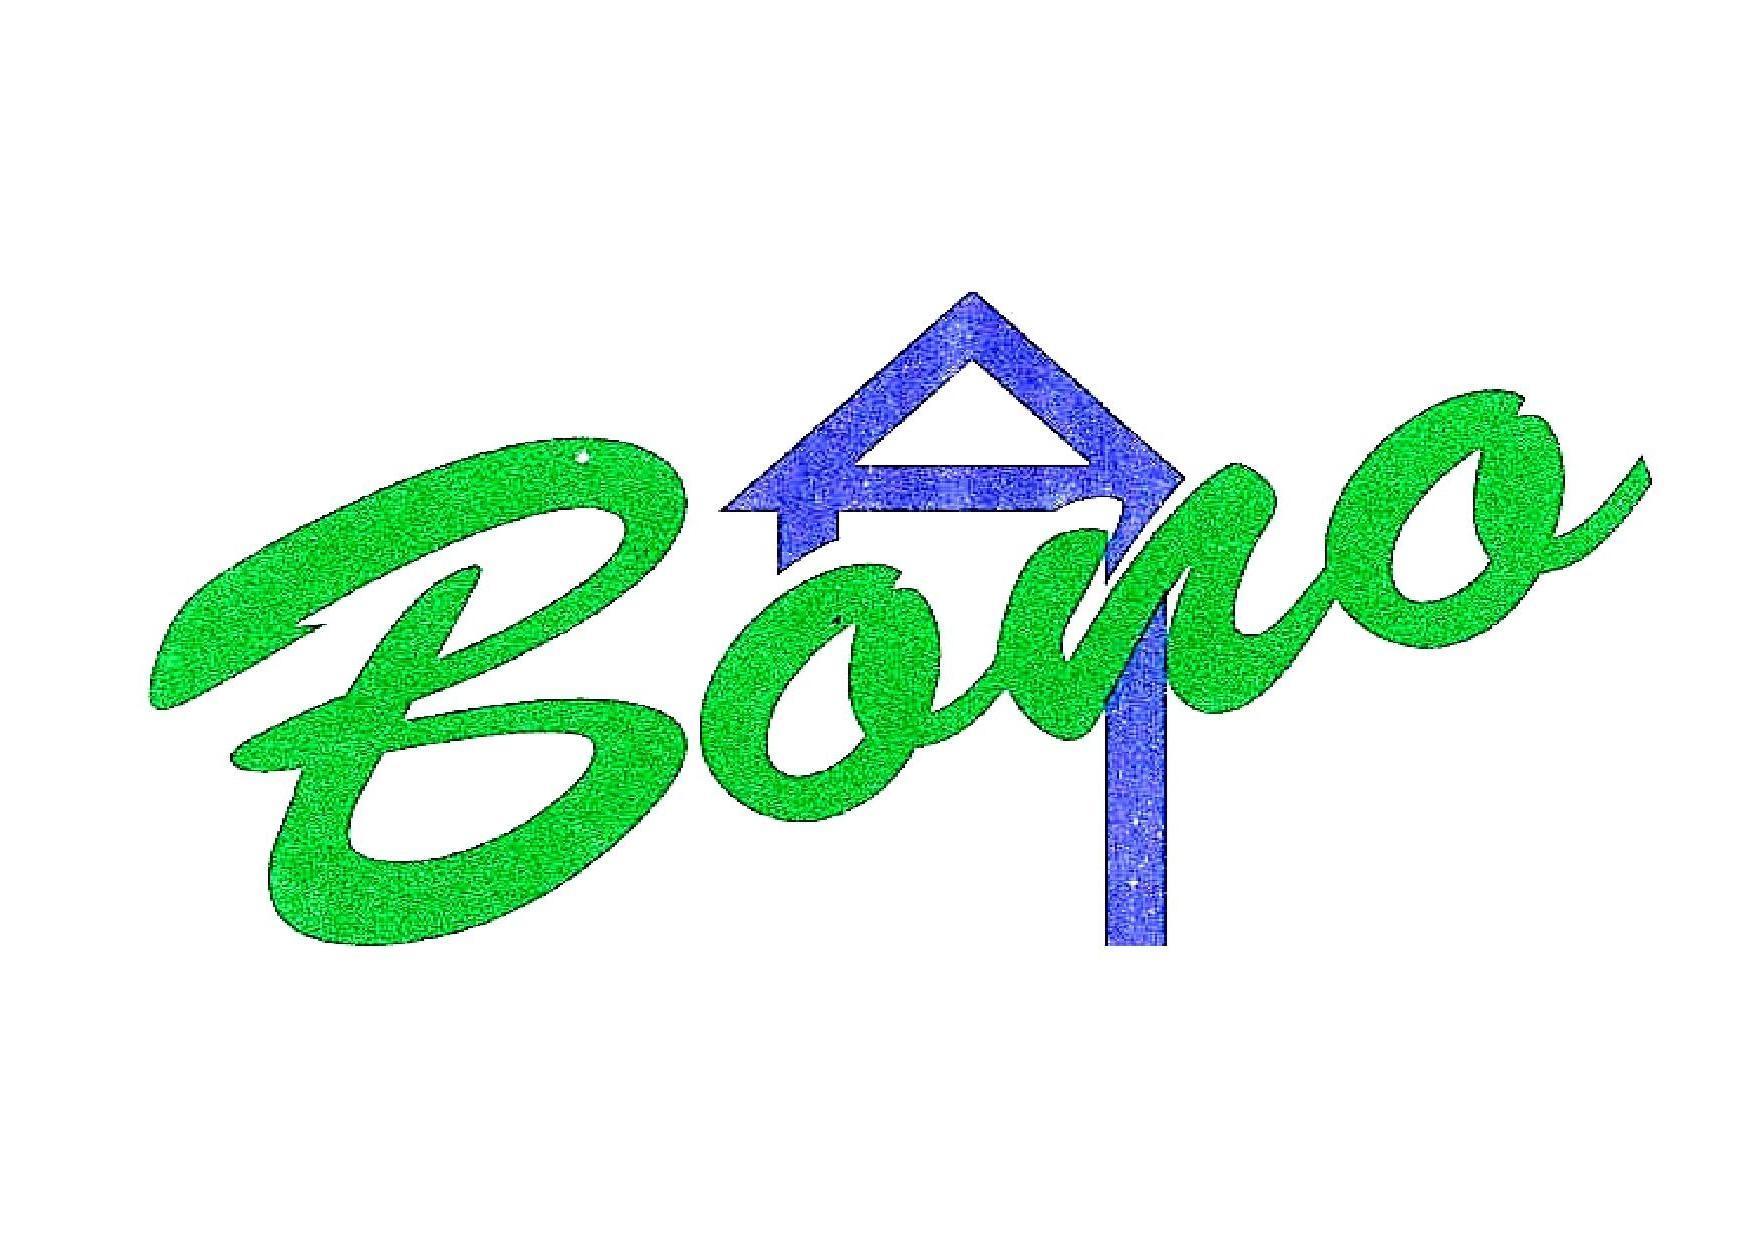 Construcciones Bono Comes S.L.